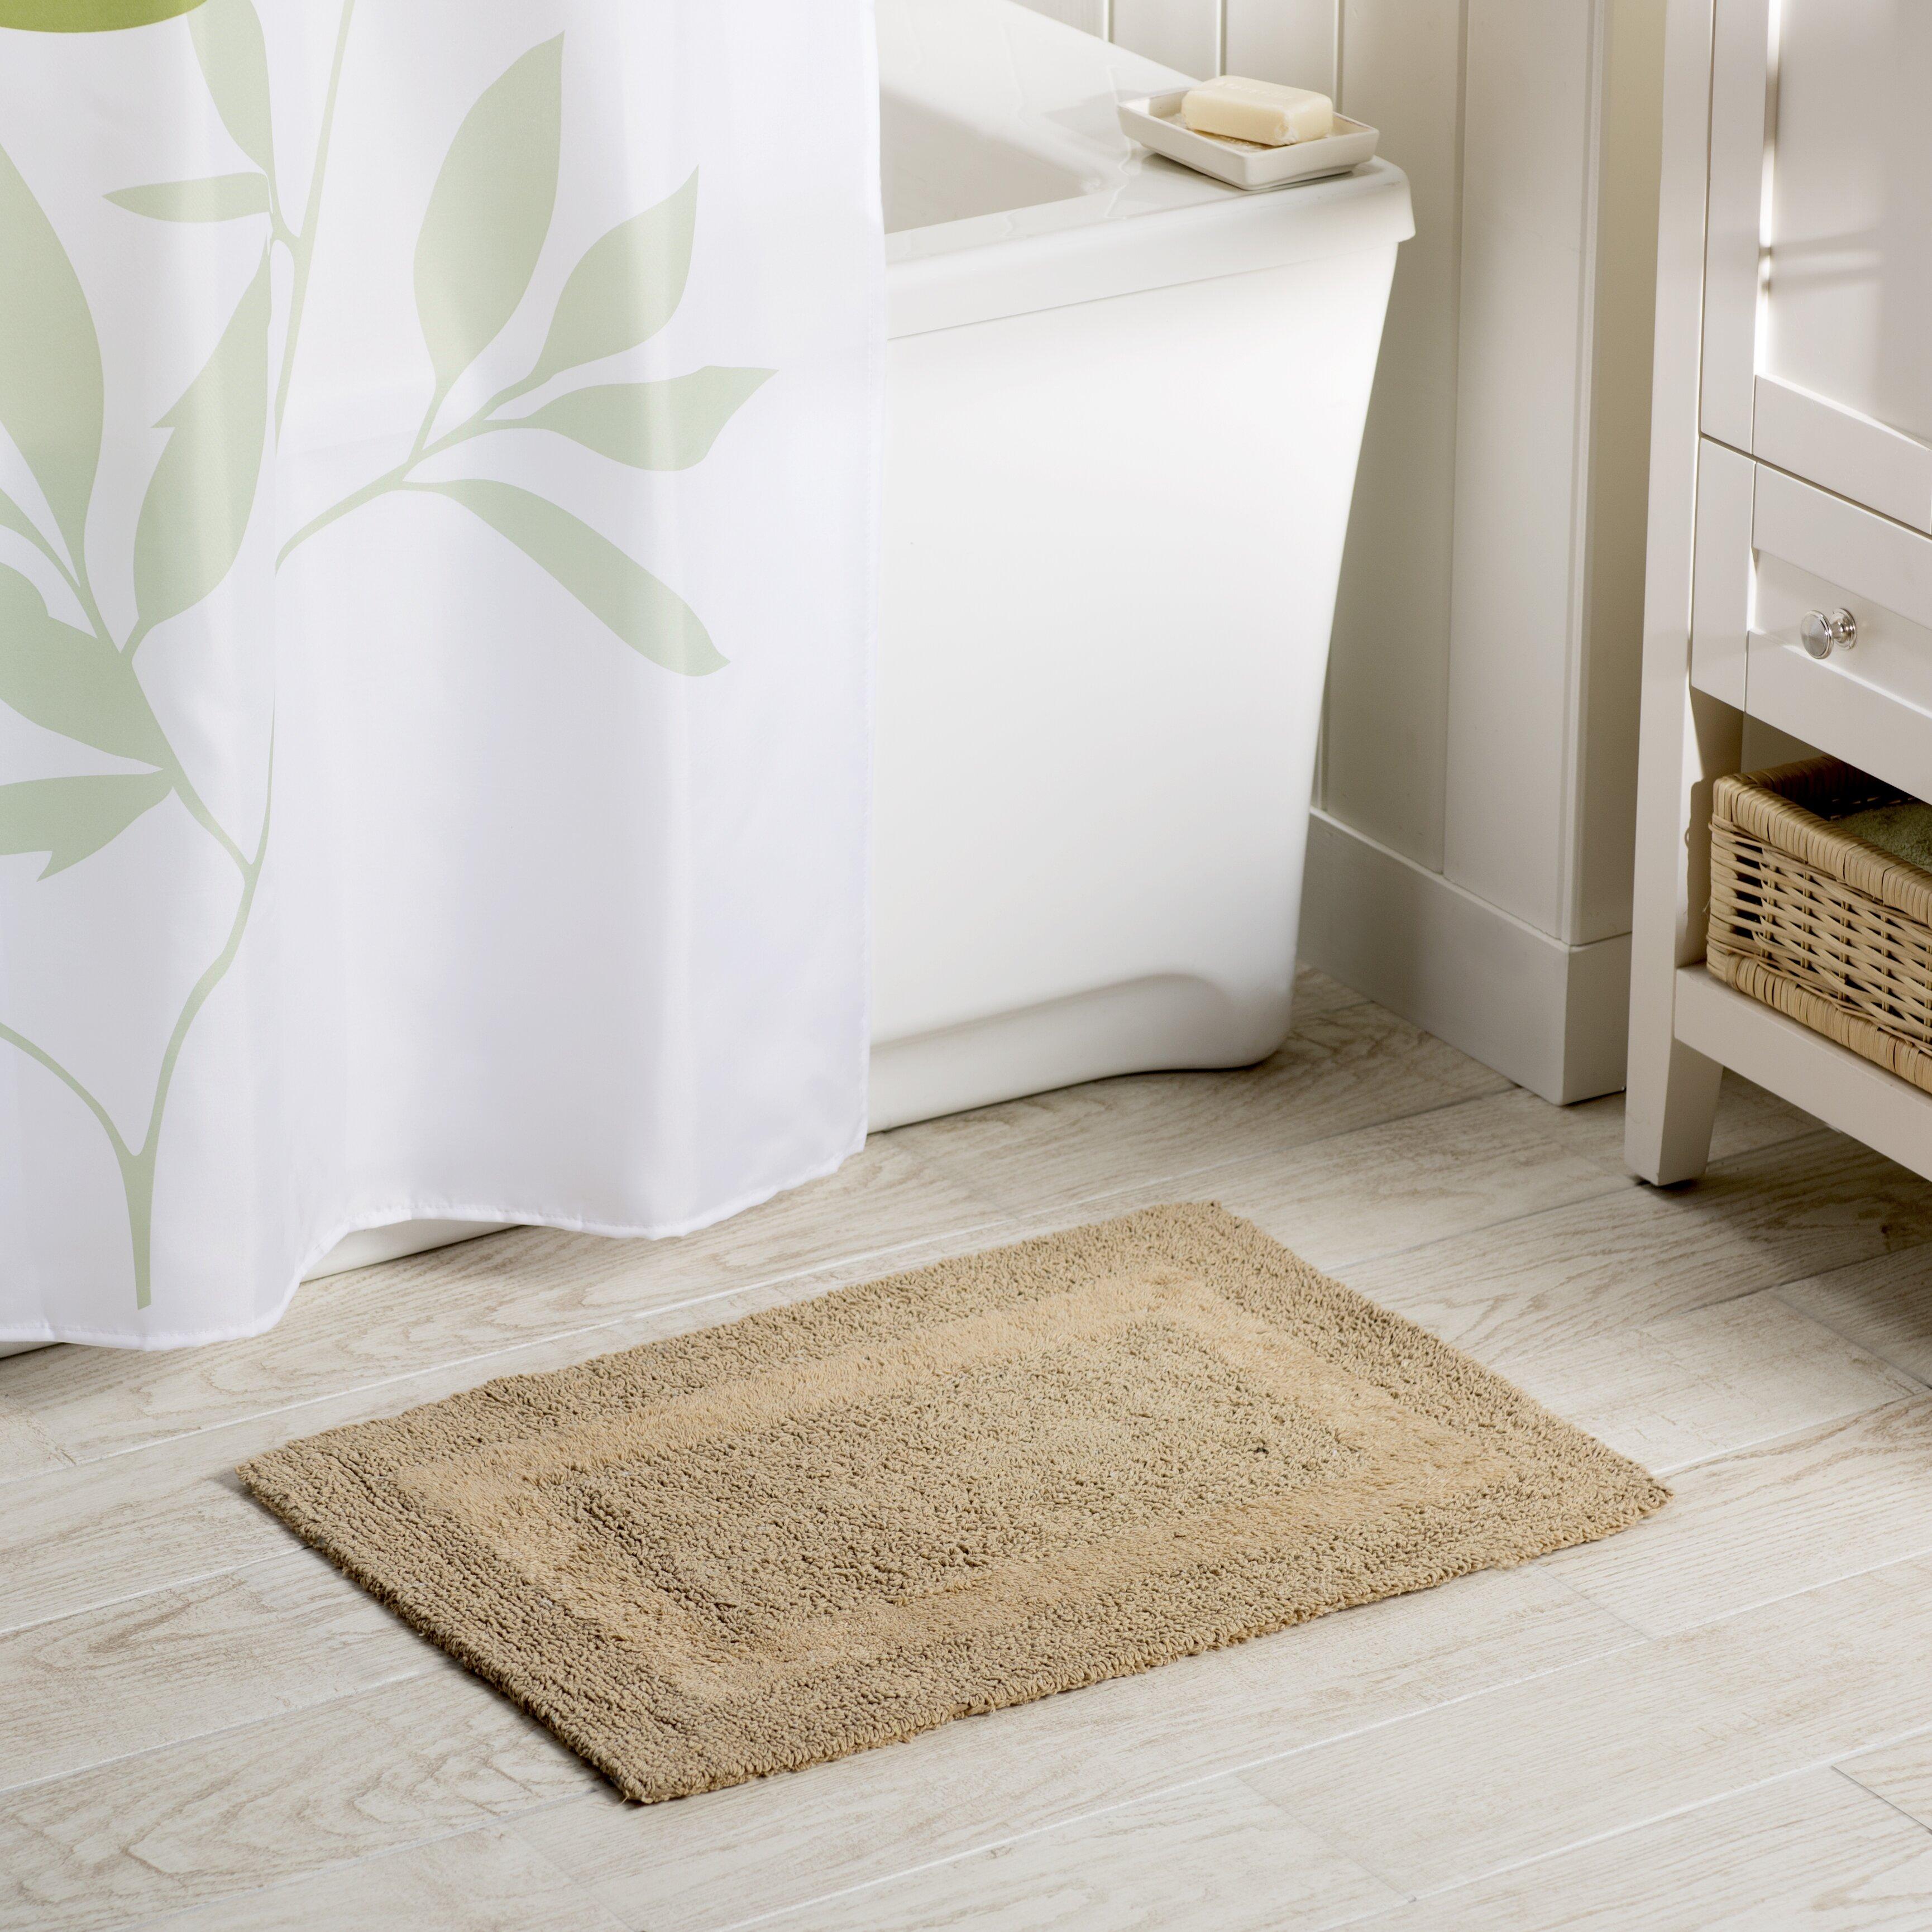 Reversible Bathroom Mats: Wayfair Basics Wayfair Basics Reversible Bath Mat